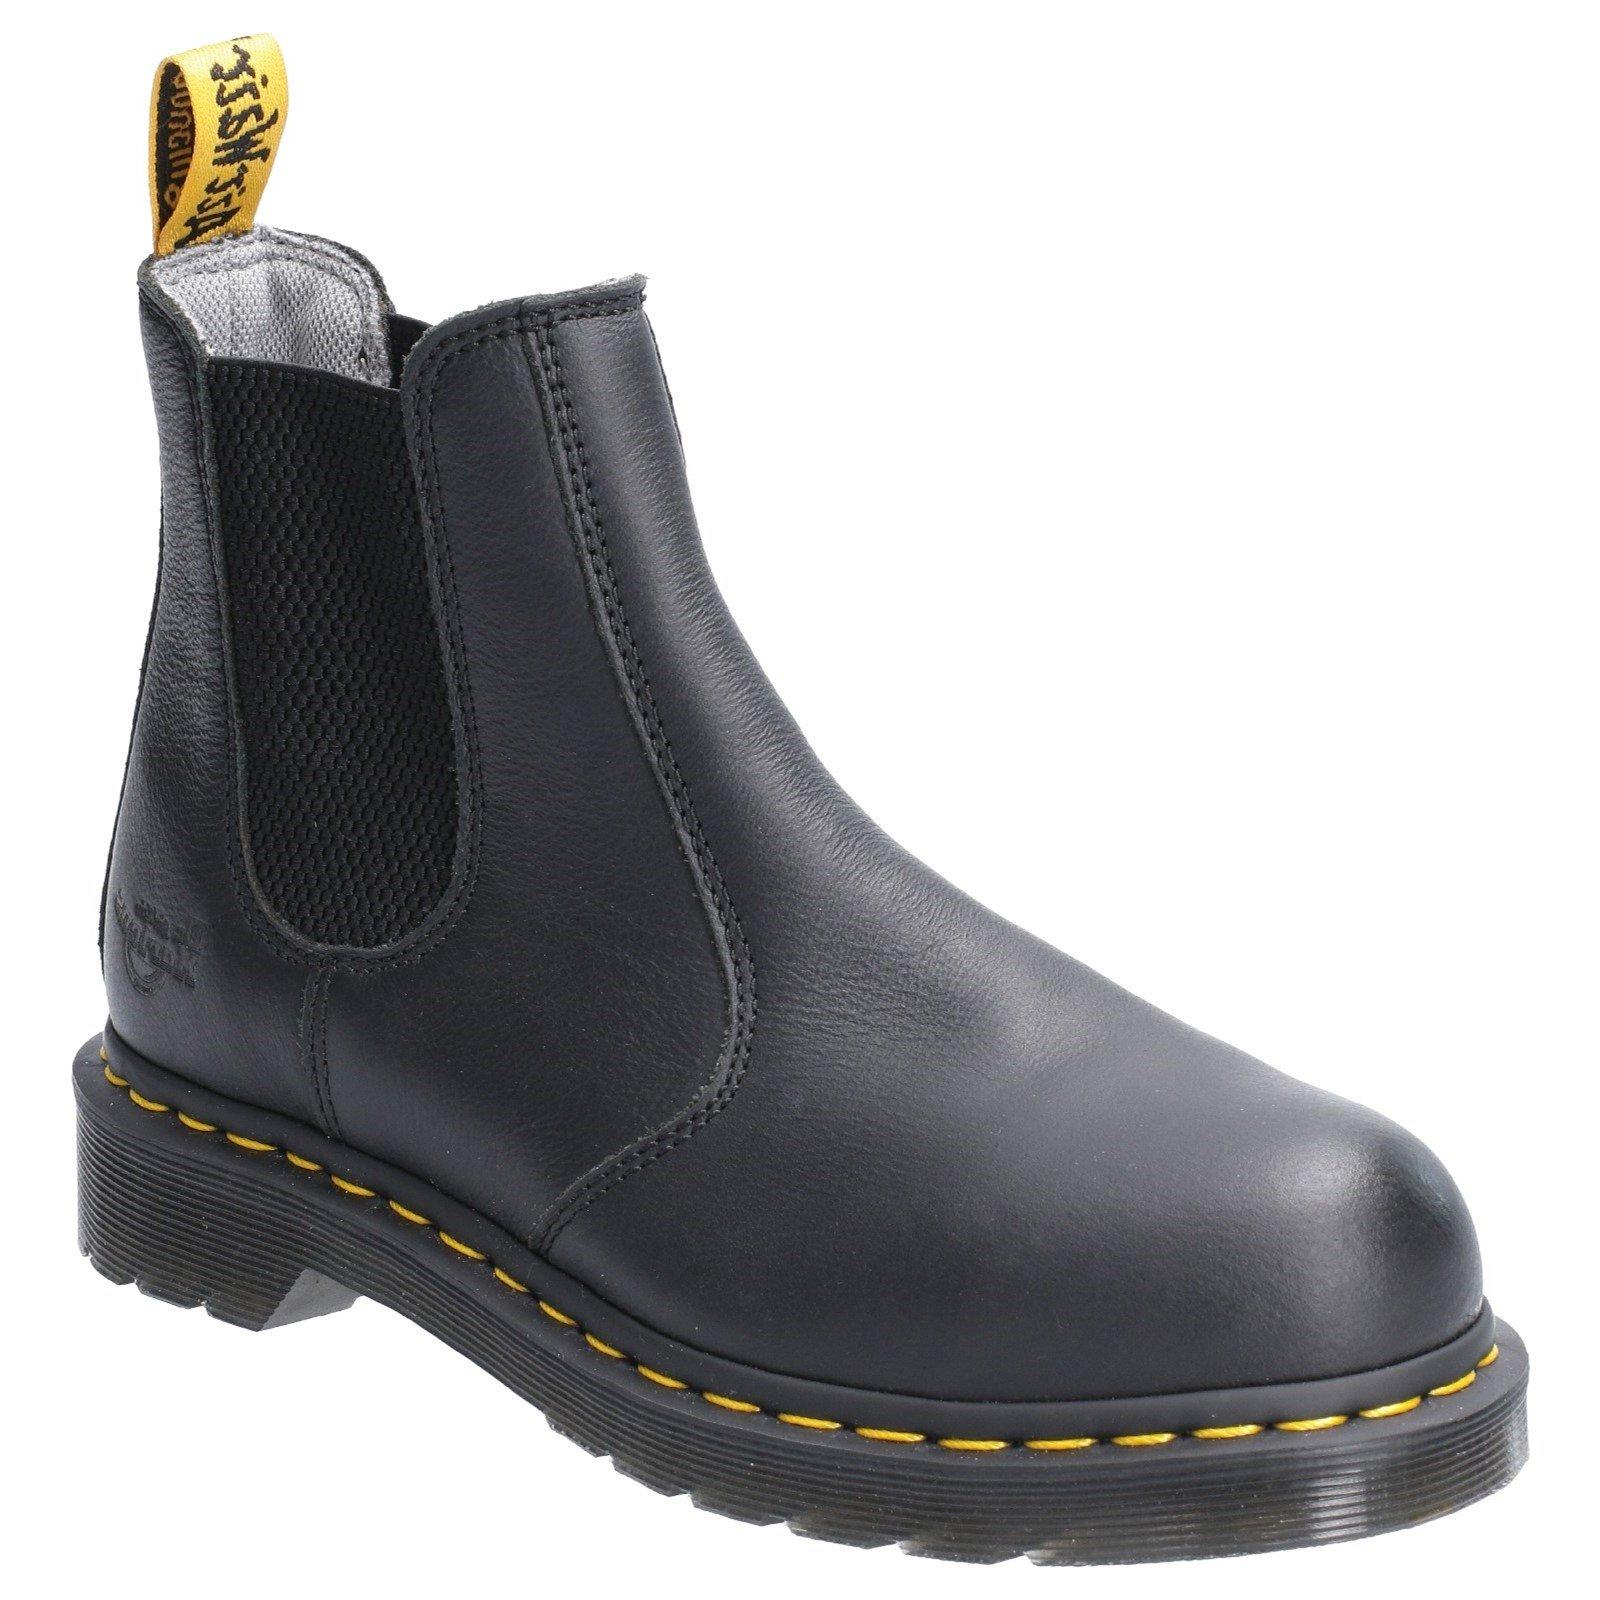 Dr Martens Women's Arbor Elastic Safety Boot Various Colours 29517 - Black 6